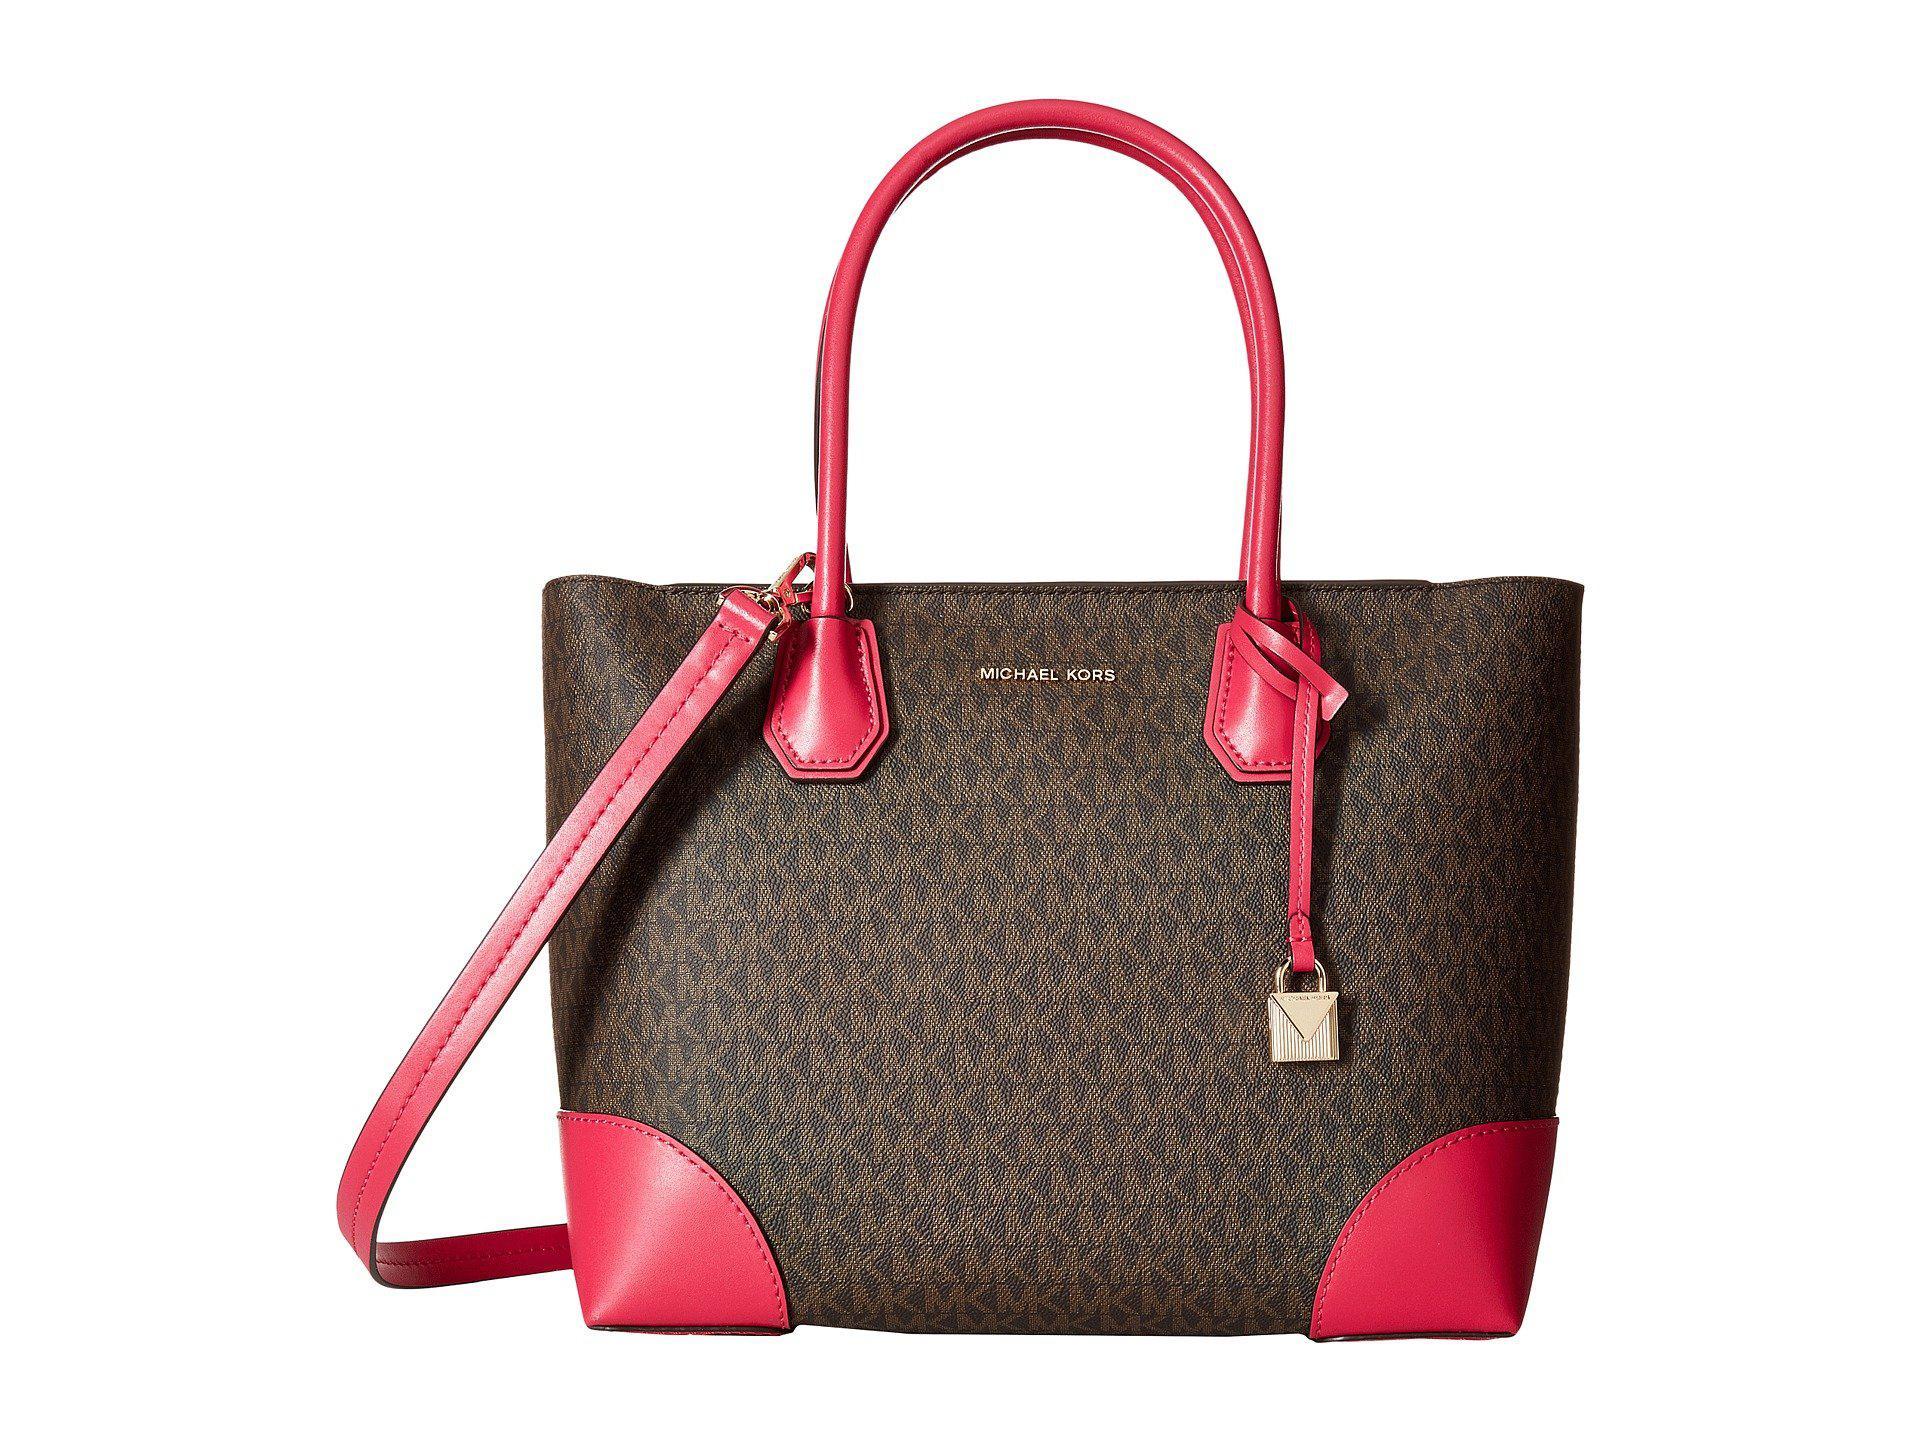 Mercer Gallery Large East-West Top Zip Tote Bag in Ultra Pink Mercer Pebble Leather Michael Michael Kors oEphbijD